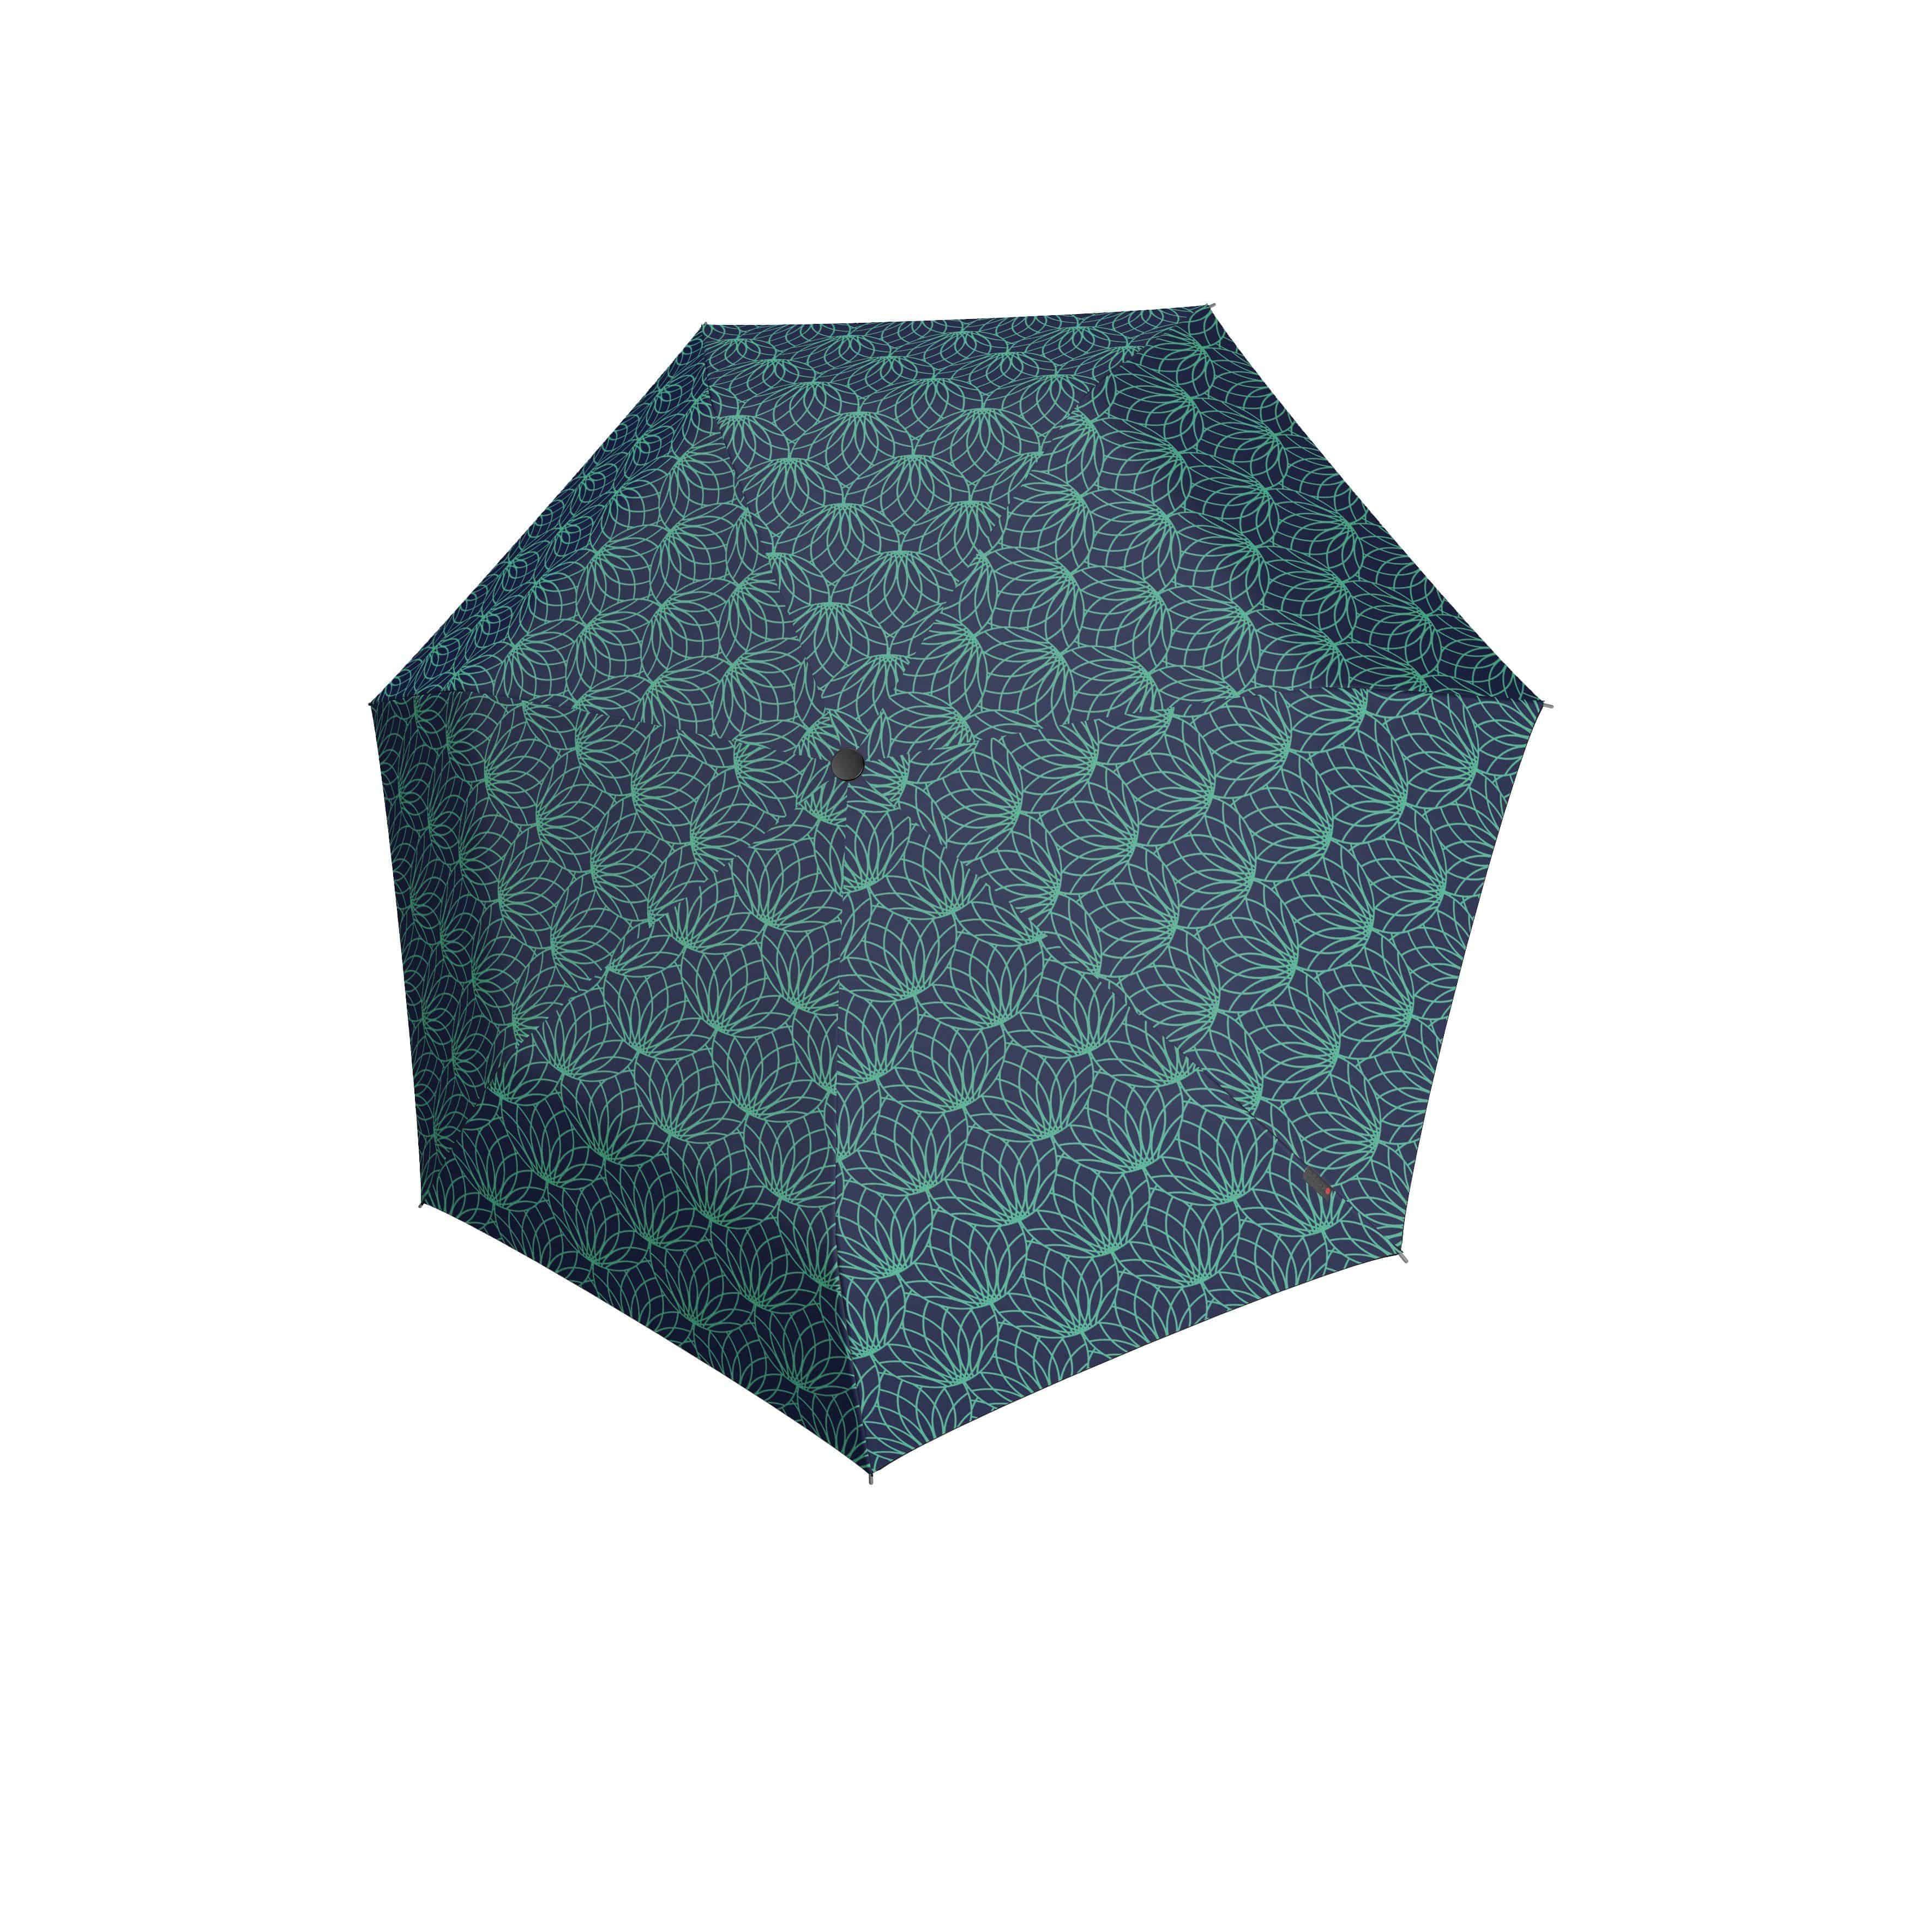 Knirps Umbrella X1 manual (7 ribs) - photo 2